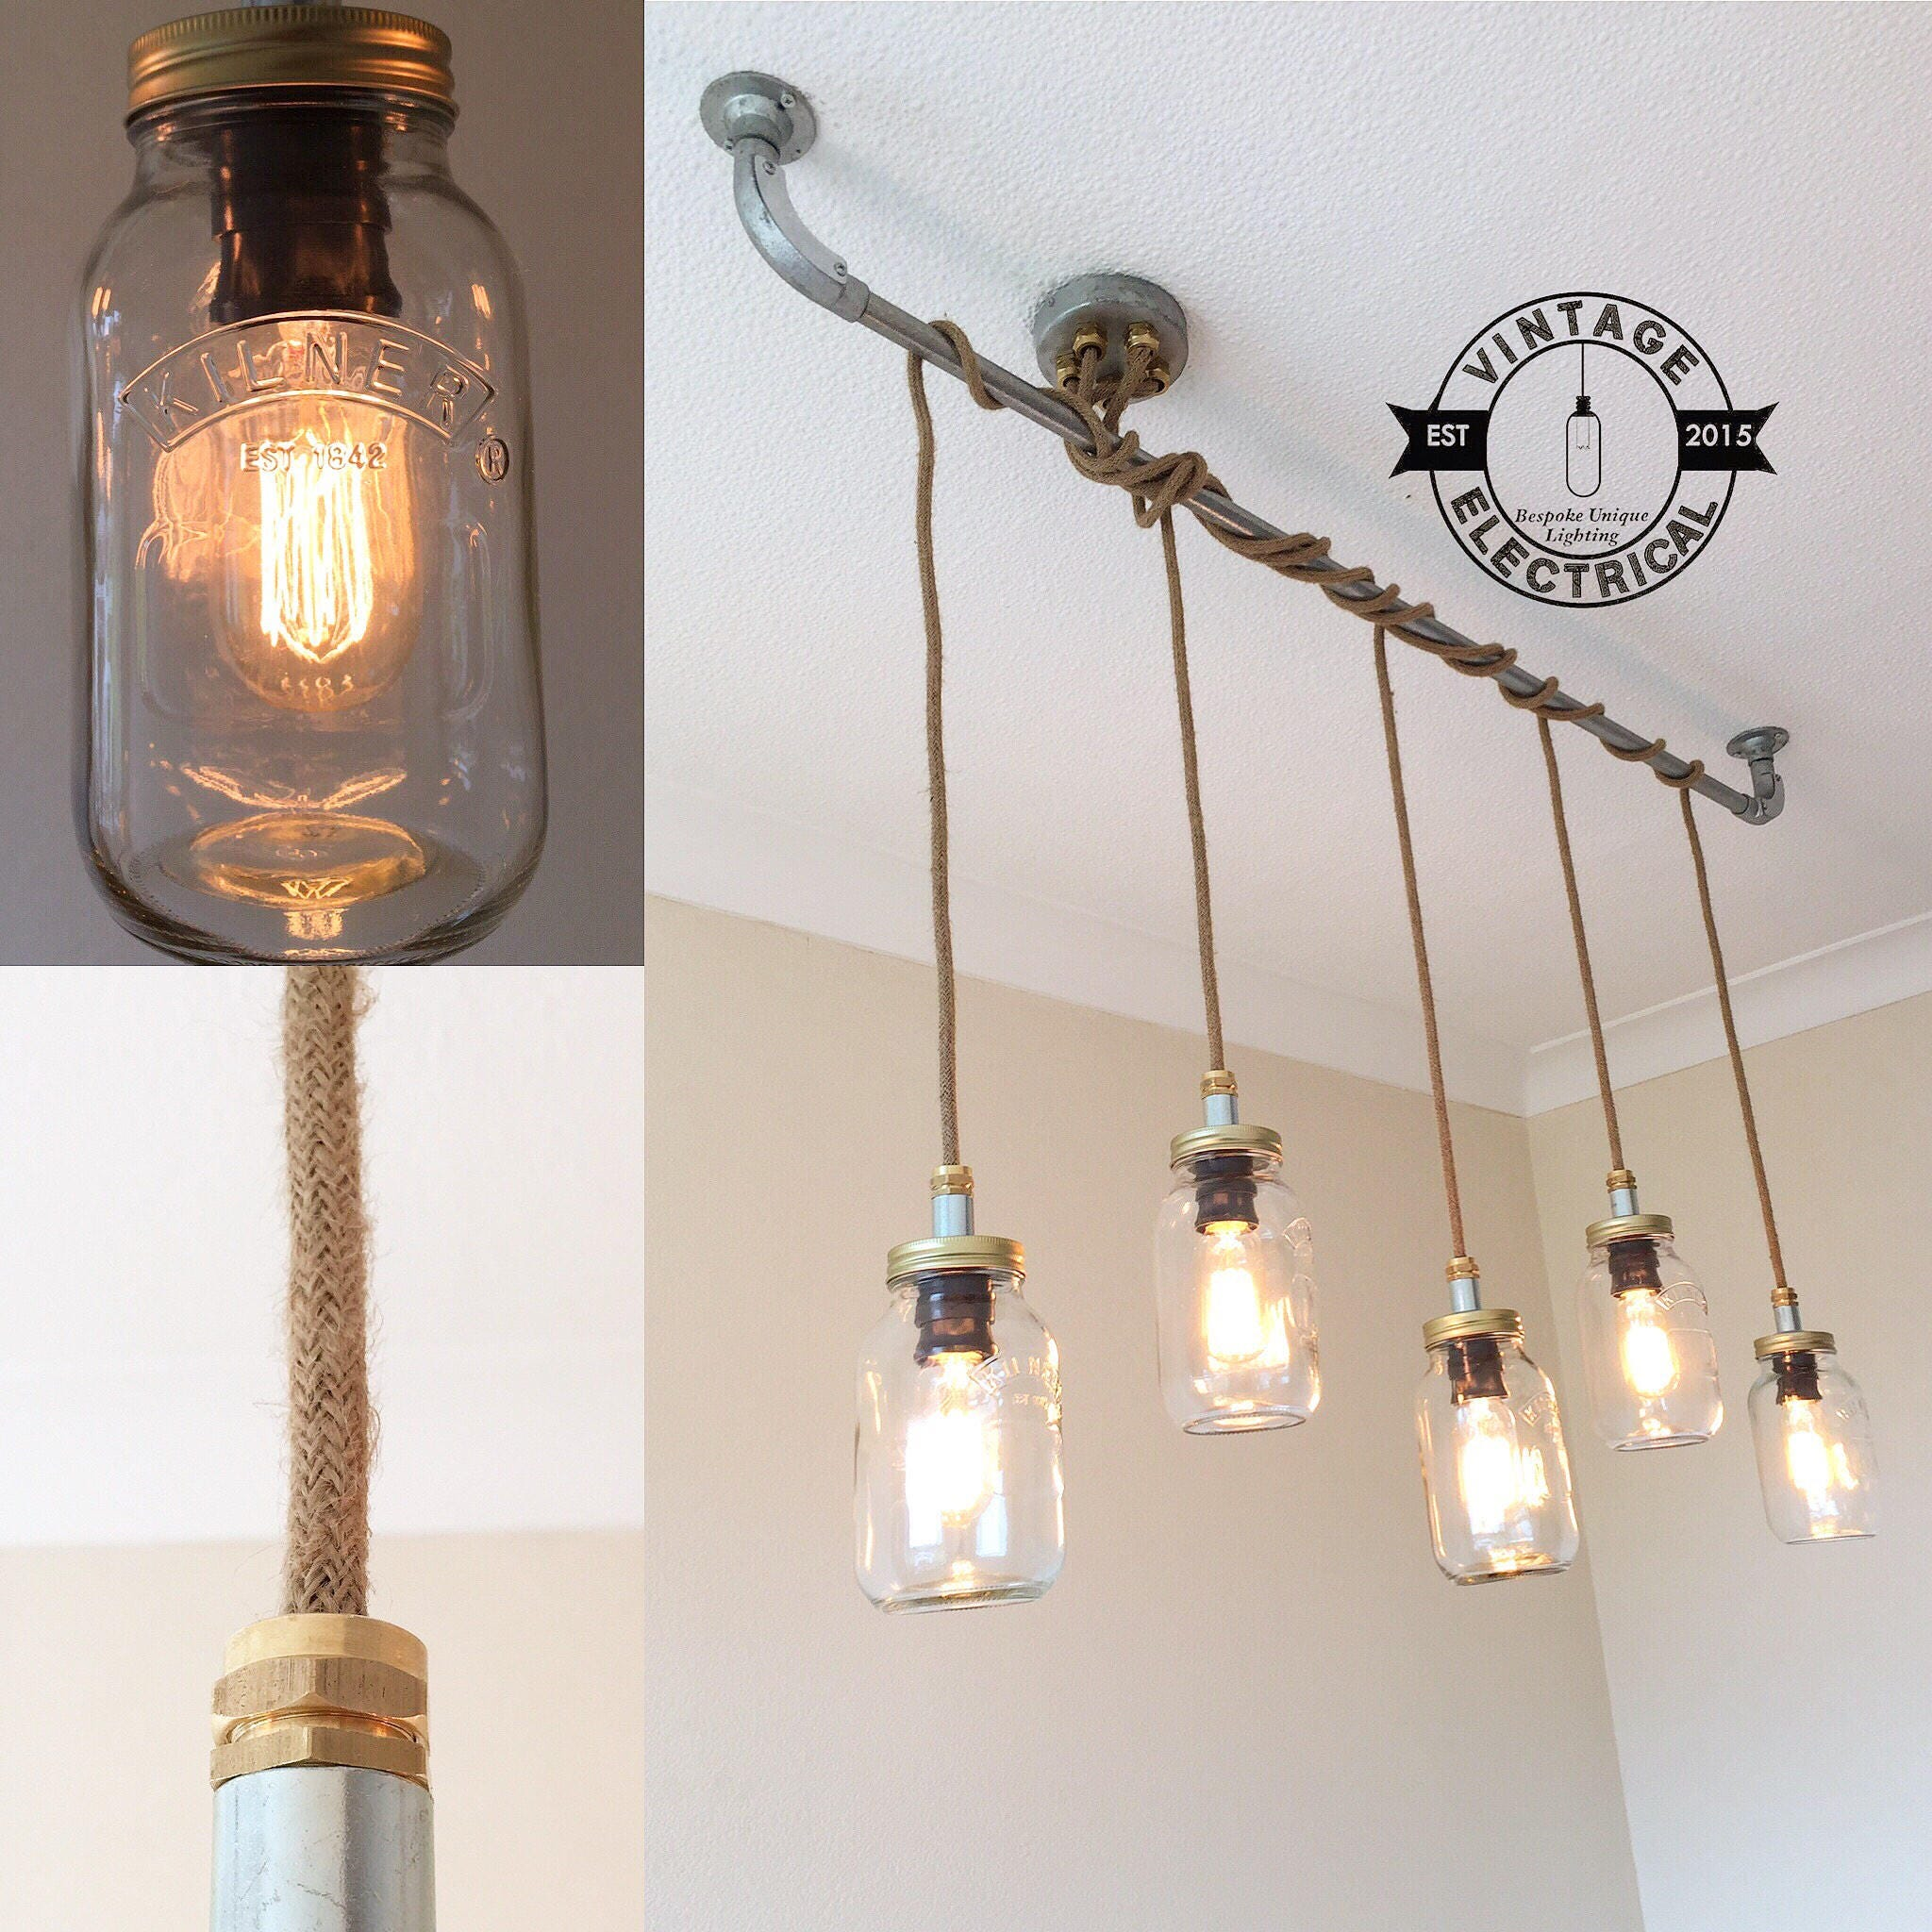 The Burnham Kilner Edition 5 X Pendant Drop Light Hanging